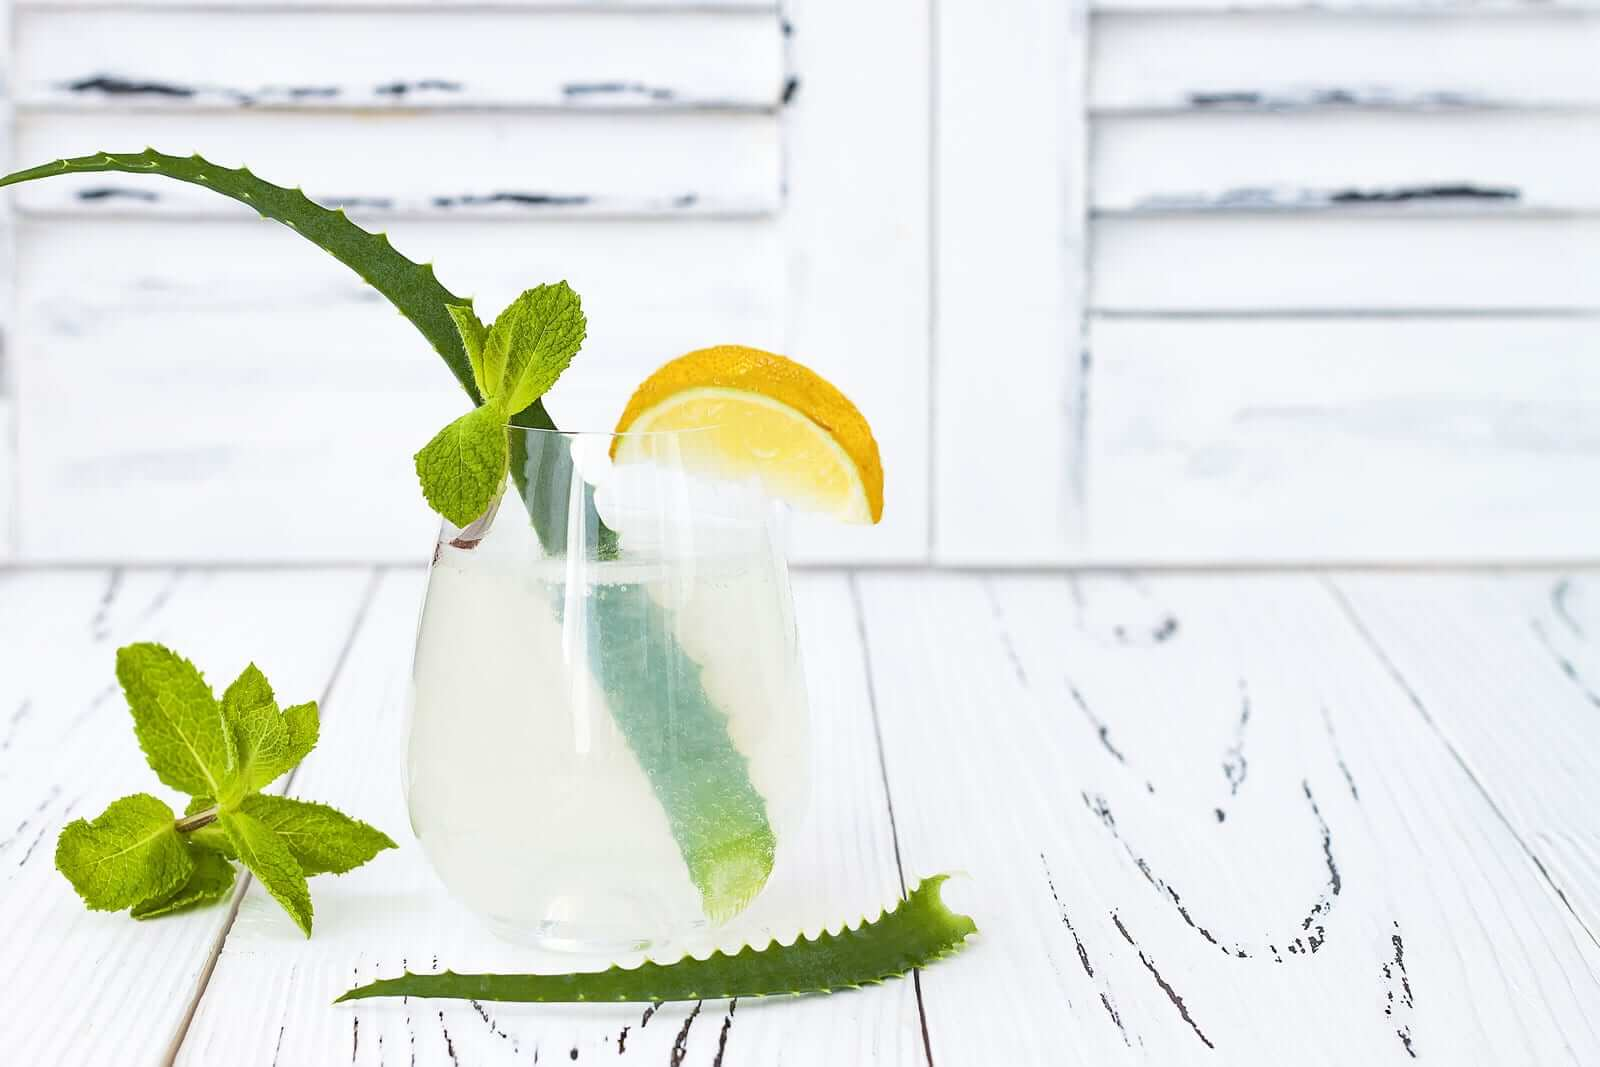 Aloe Vera Zitronen Rezept Detox Wasser